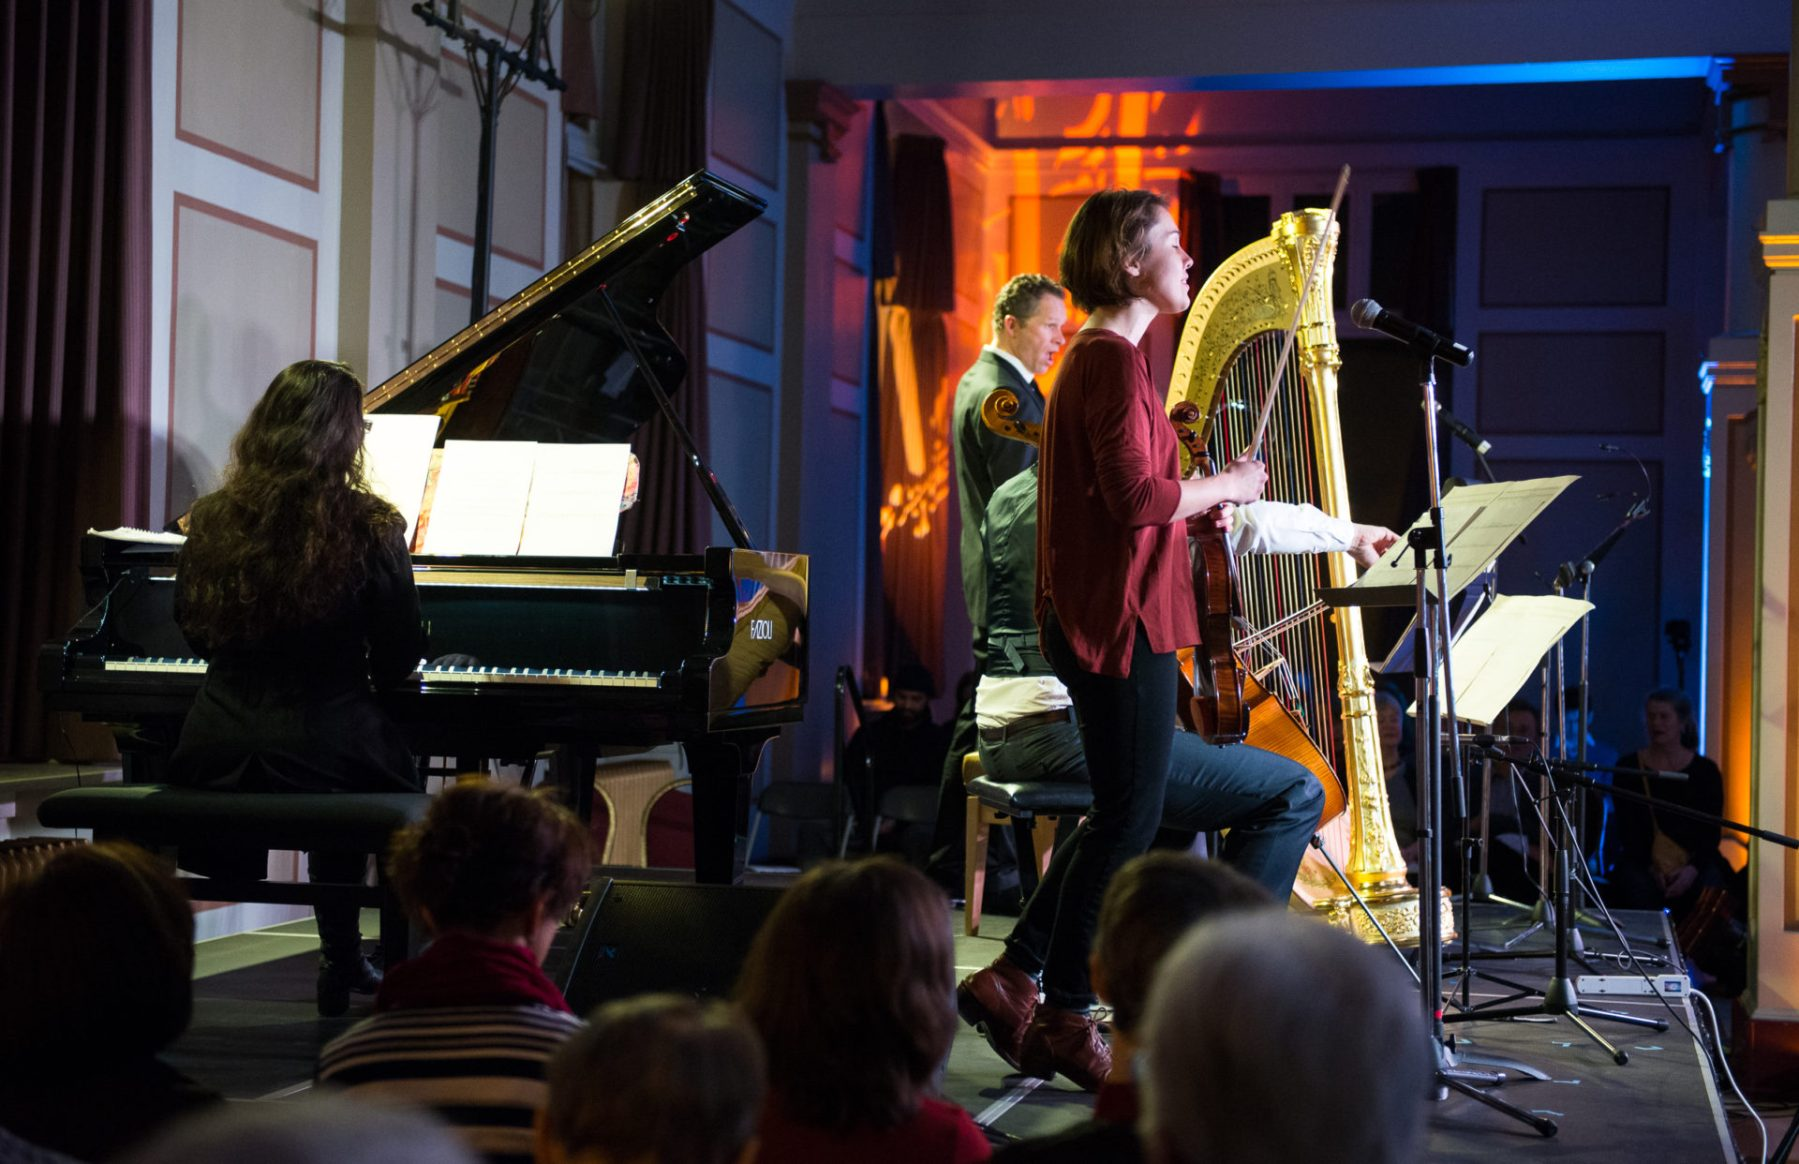 Rachel Kiyo Iwaasa, Steve Maddock, Ariel Barnes, Heidi Krutzen & Caroline Shaw, Music for the Winter Solstice 2015